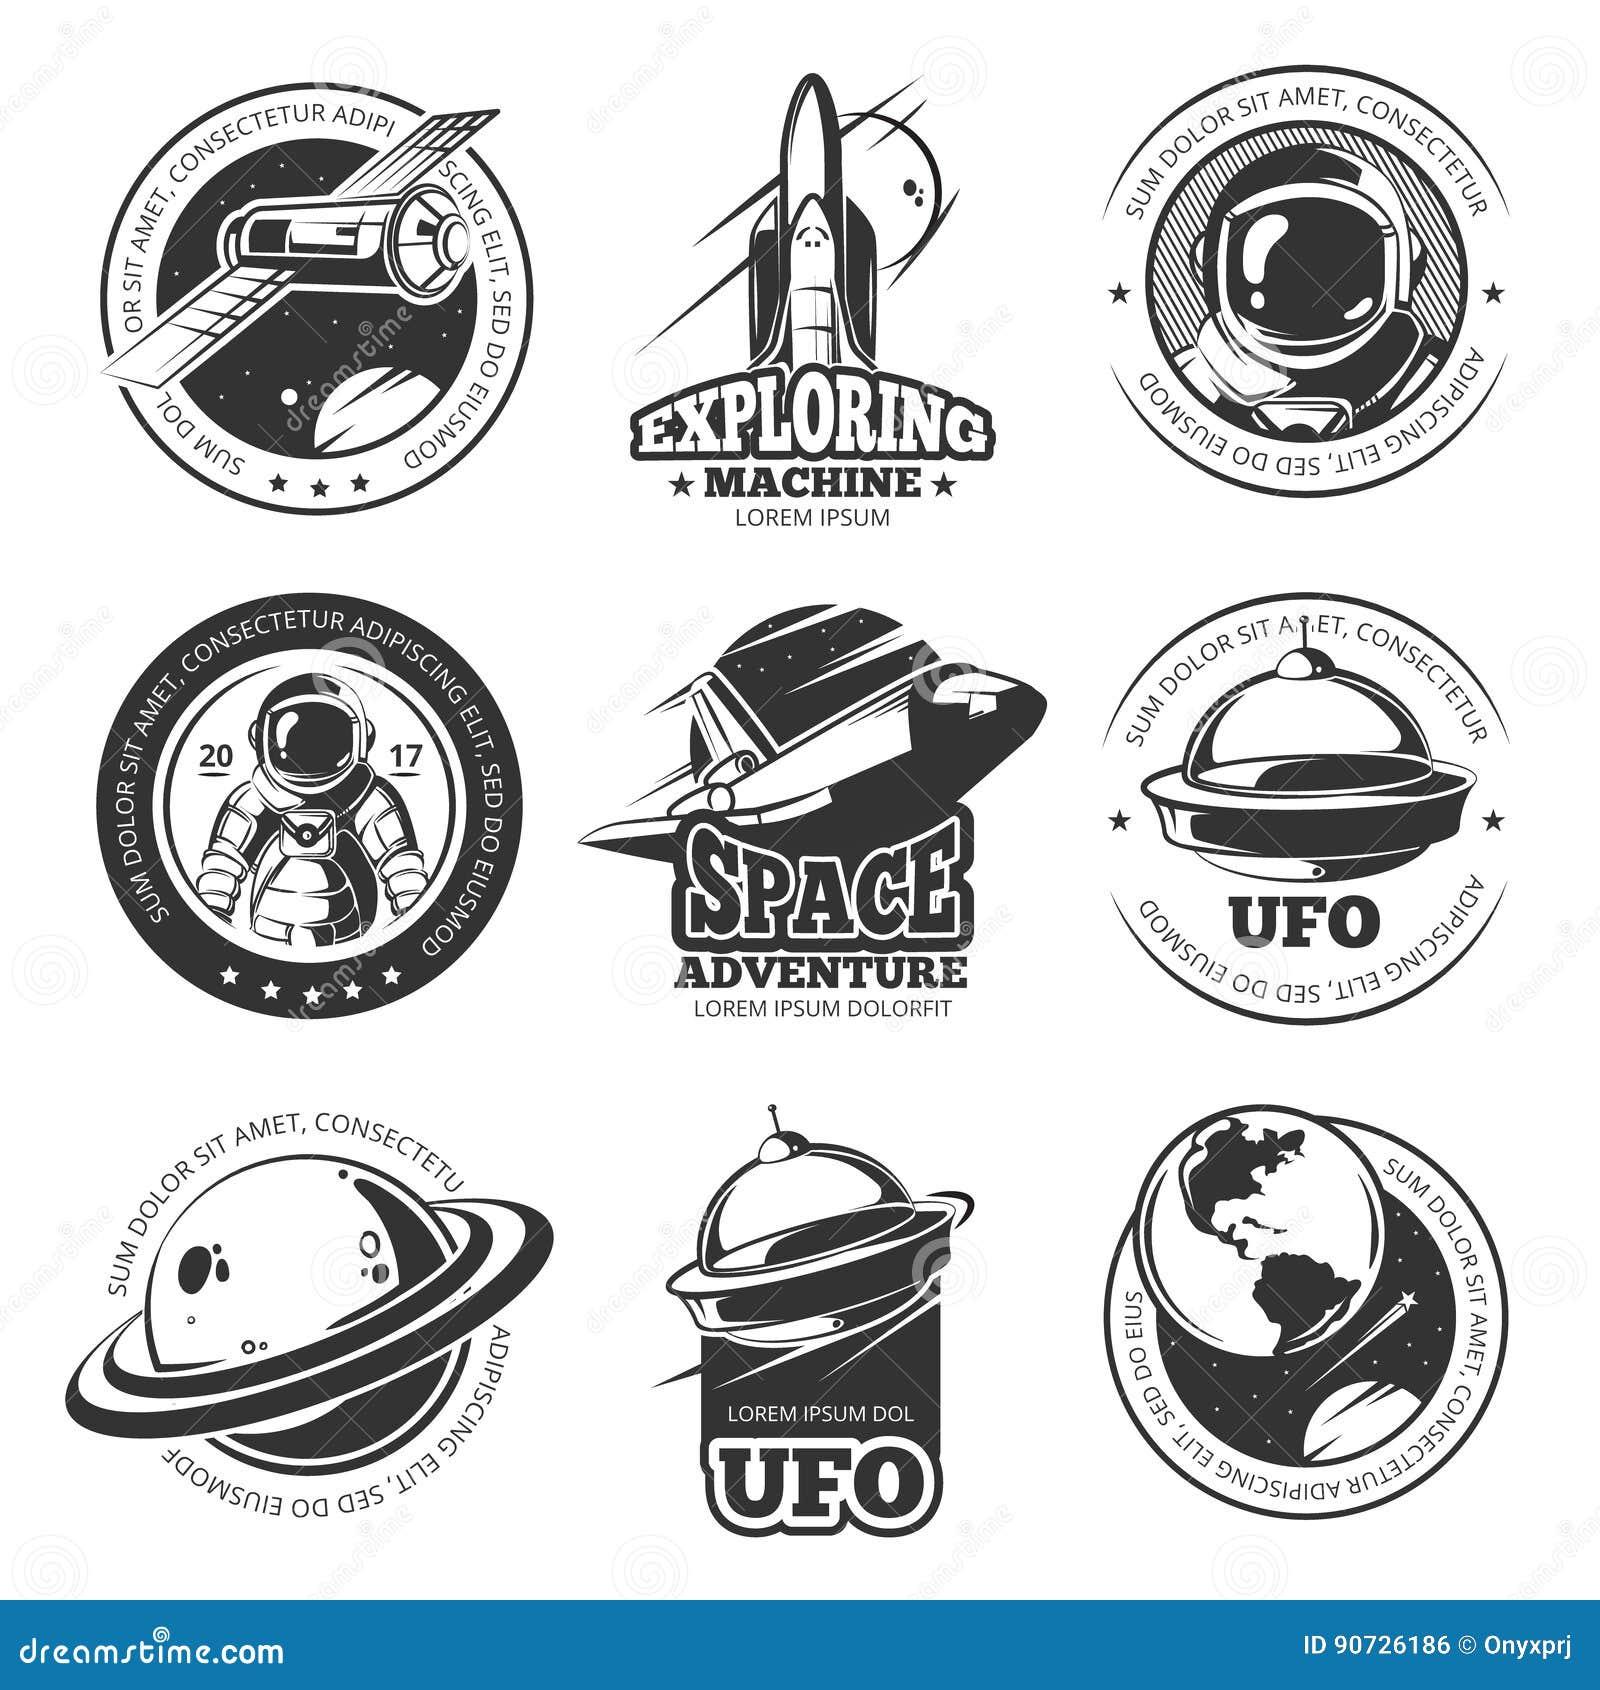 Espaço retro, astronauta, astronomia, etiquetas do vetor de canela da nave espacial, logotipos, crachás, emblemas